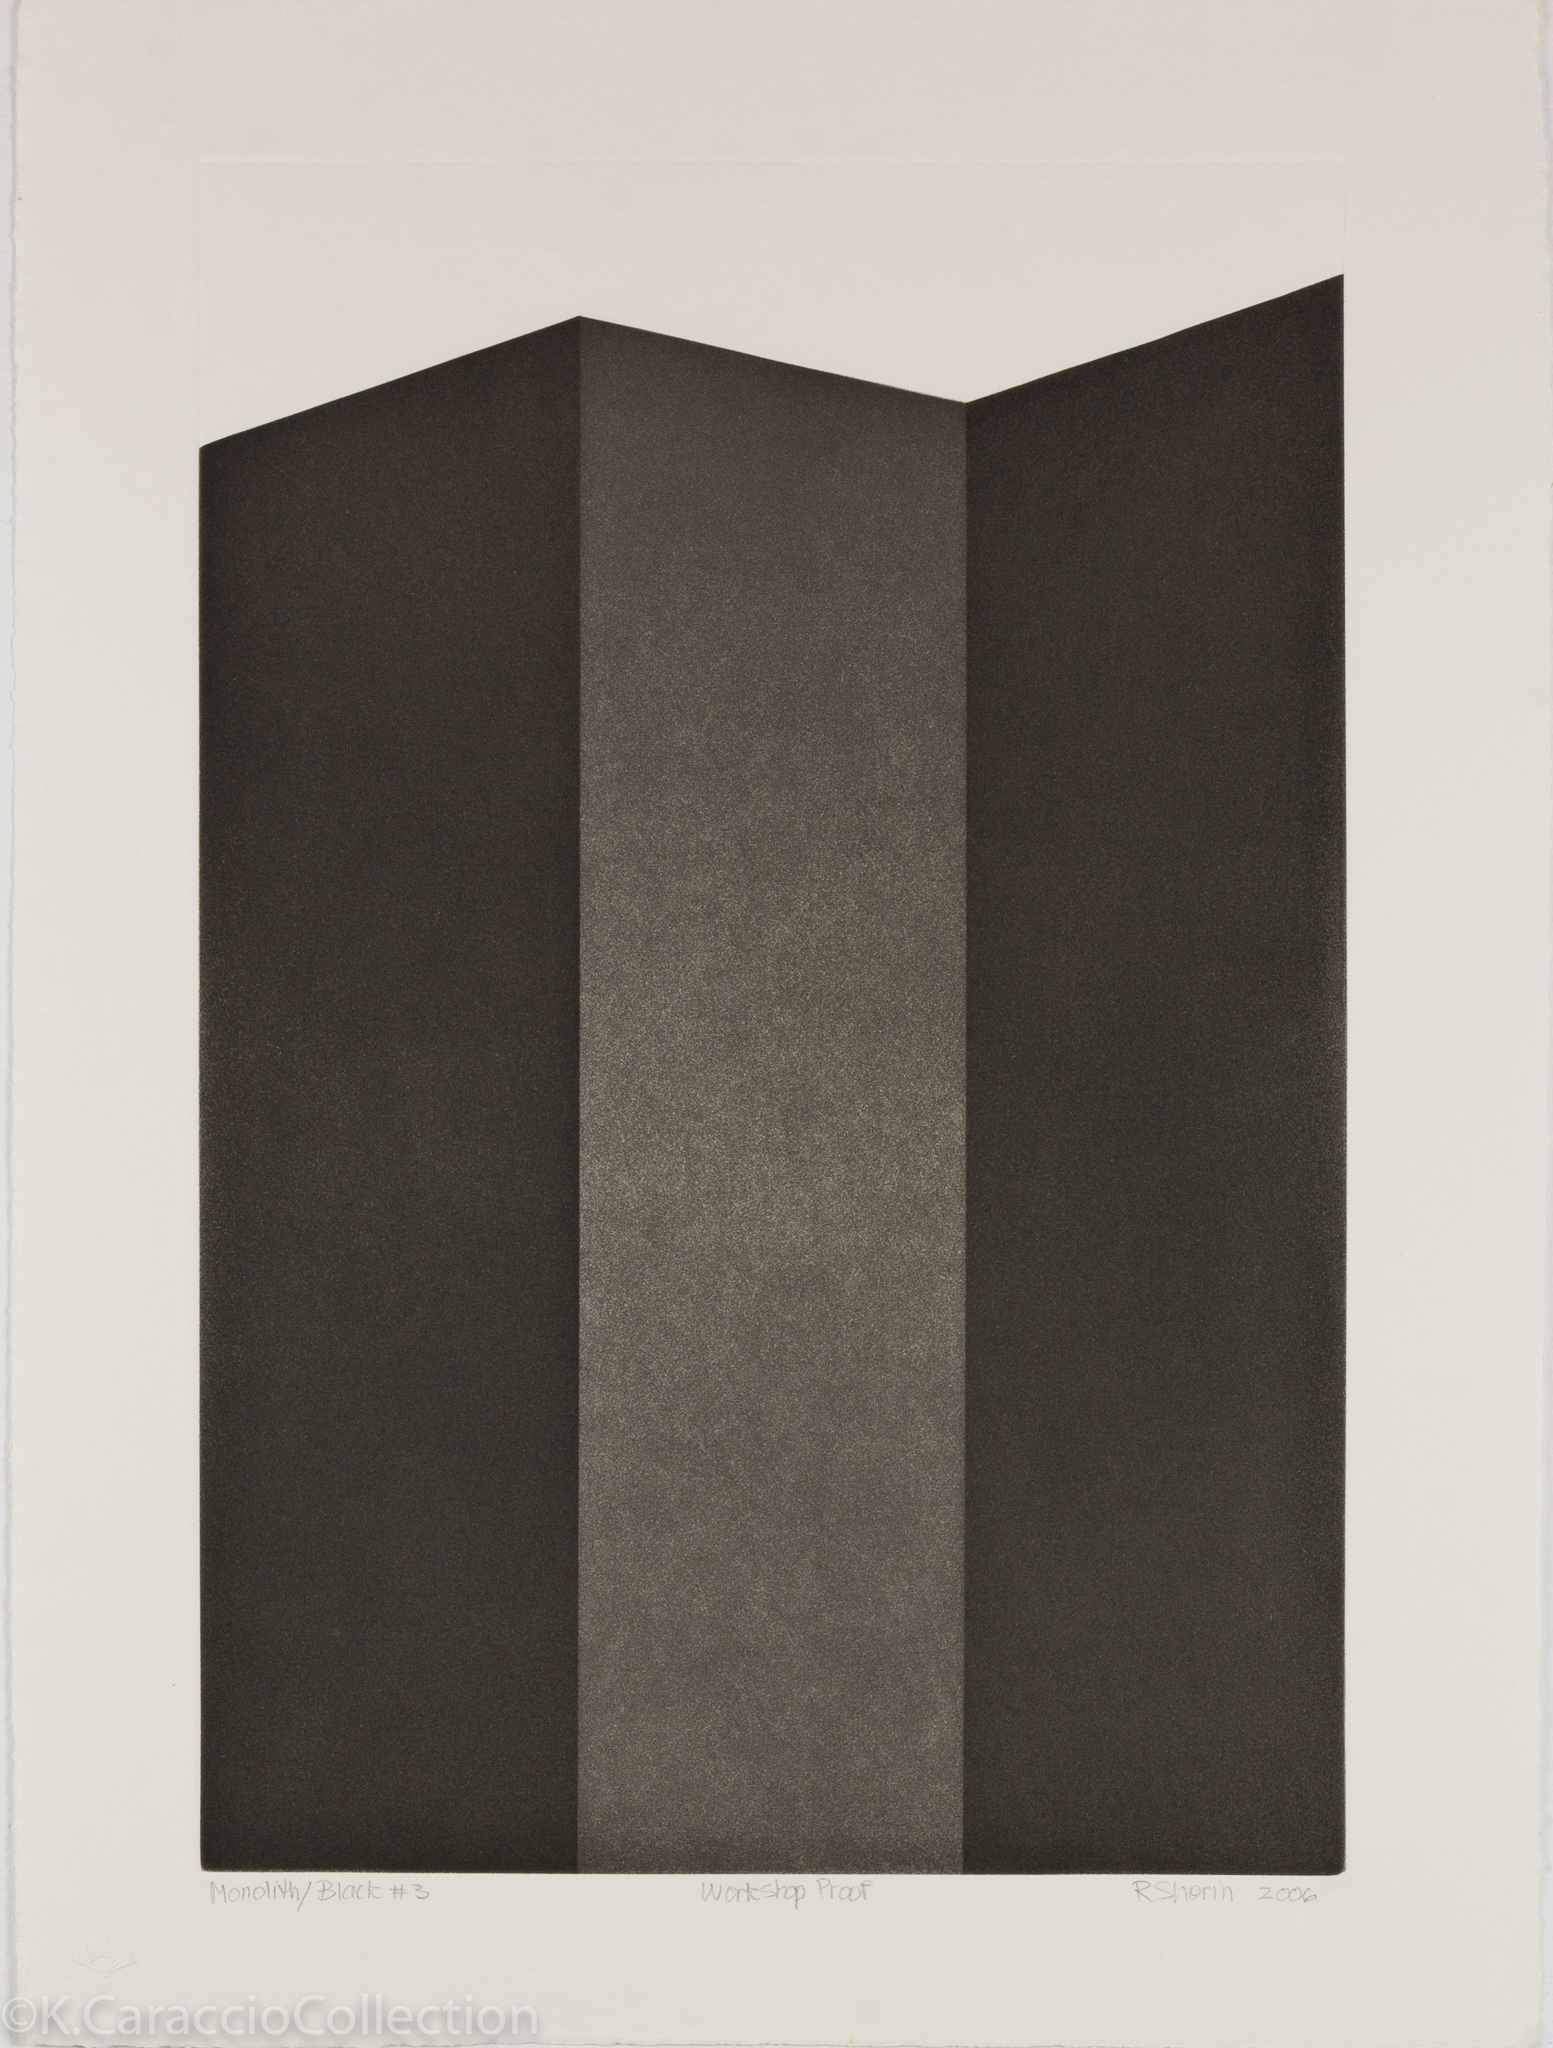 Monolith/Black #3, 2006